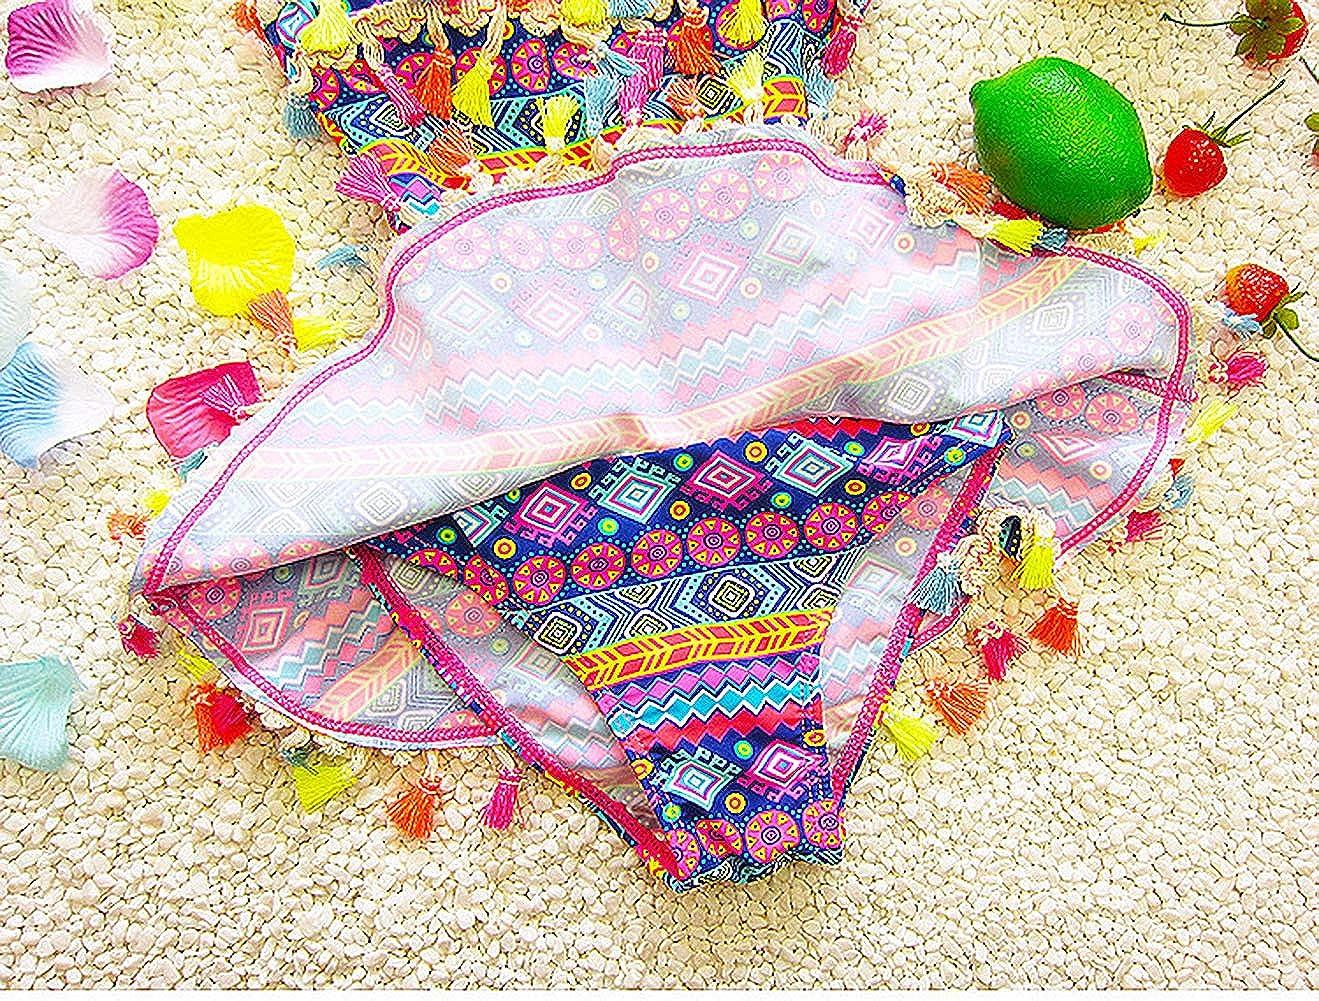 Dear Tomorrow One-Piece Bohemia Swimsuit Unique Tassel Swimwear for Baby Girls